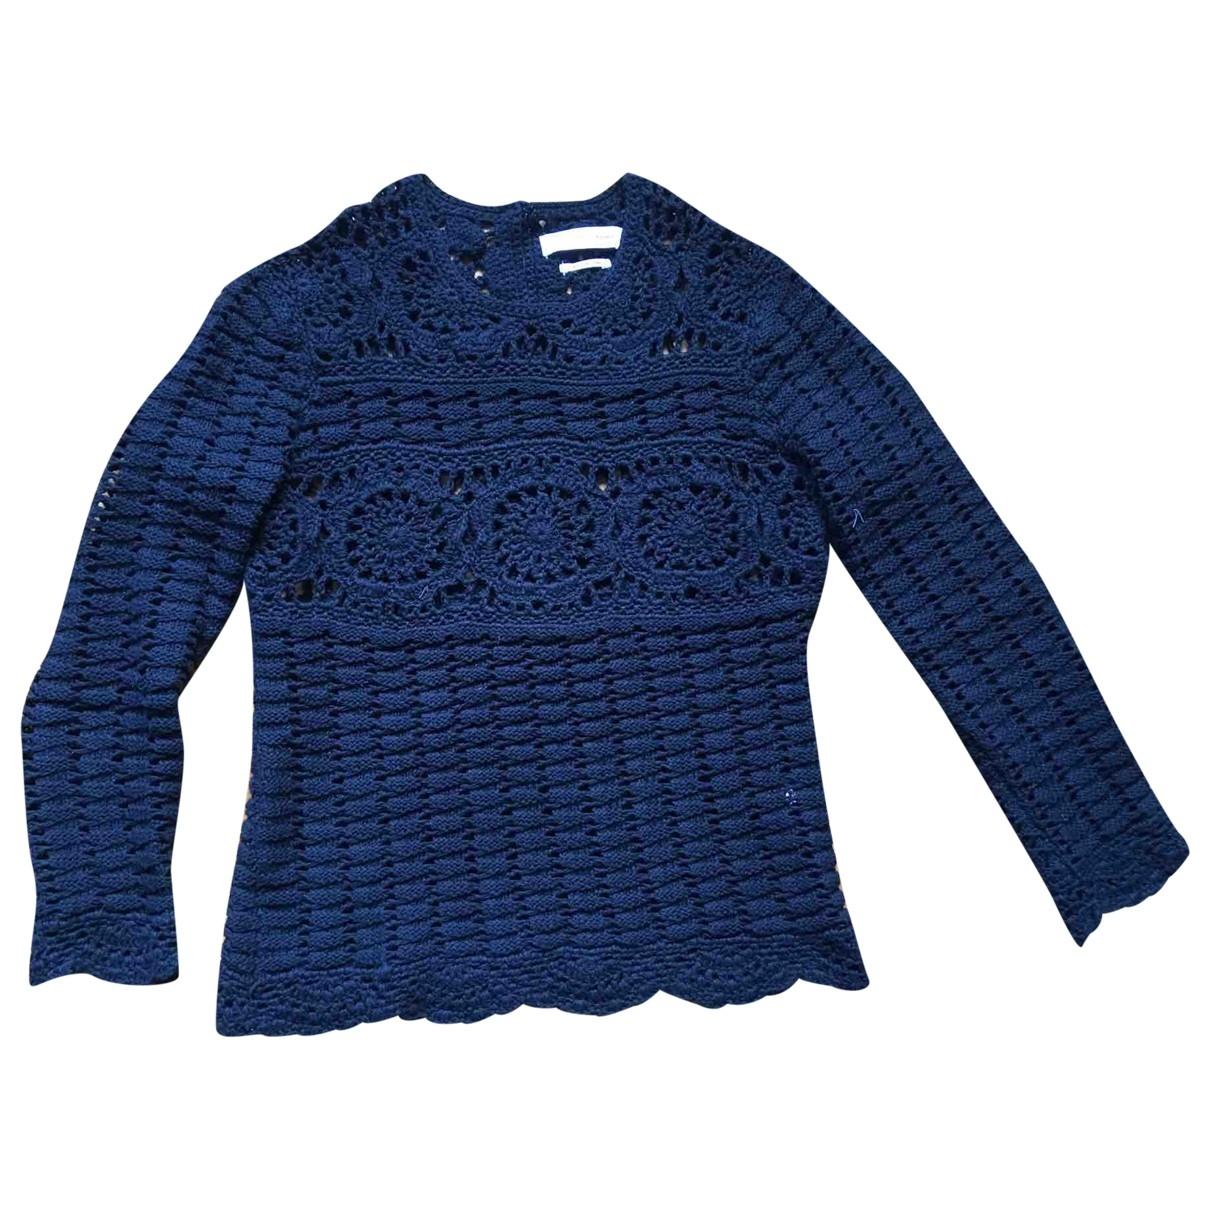 Isabel Marant Etoile \N Navy Cotton Knitwear for Women 34 FR